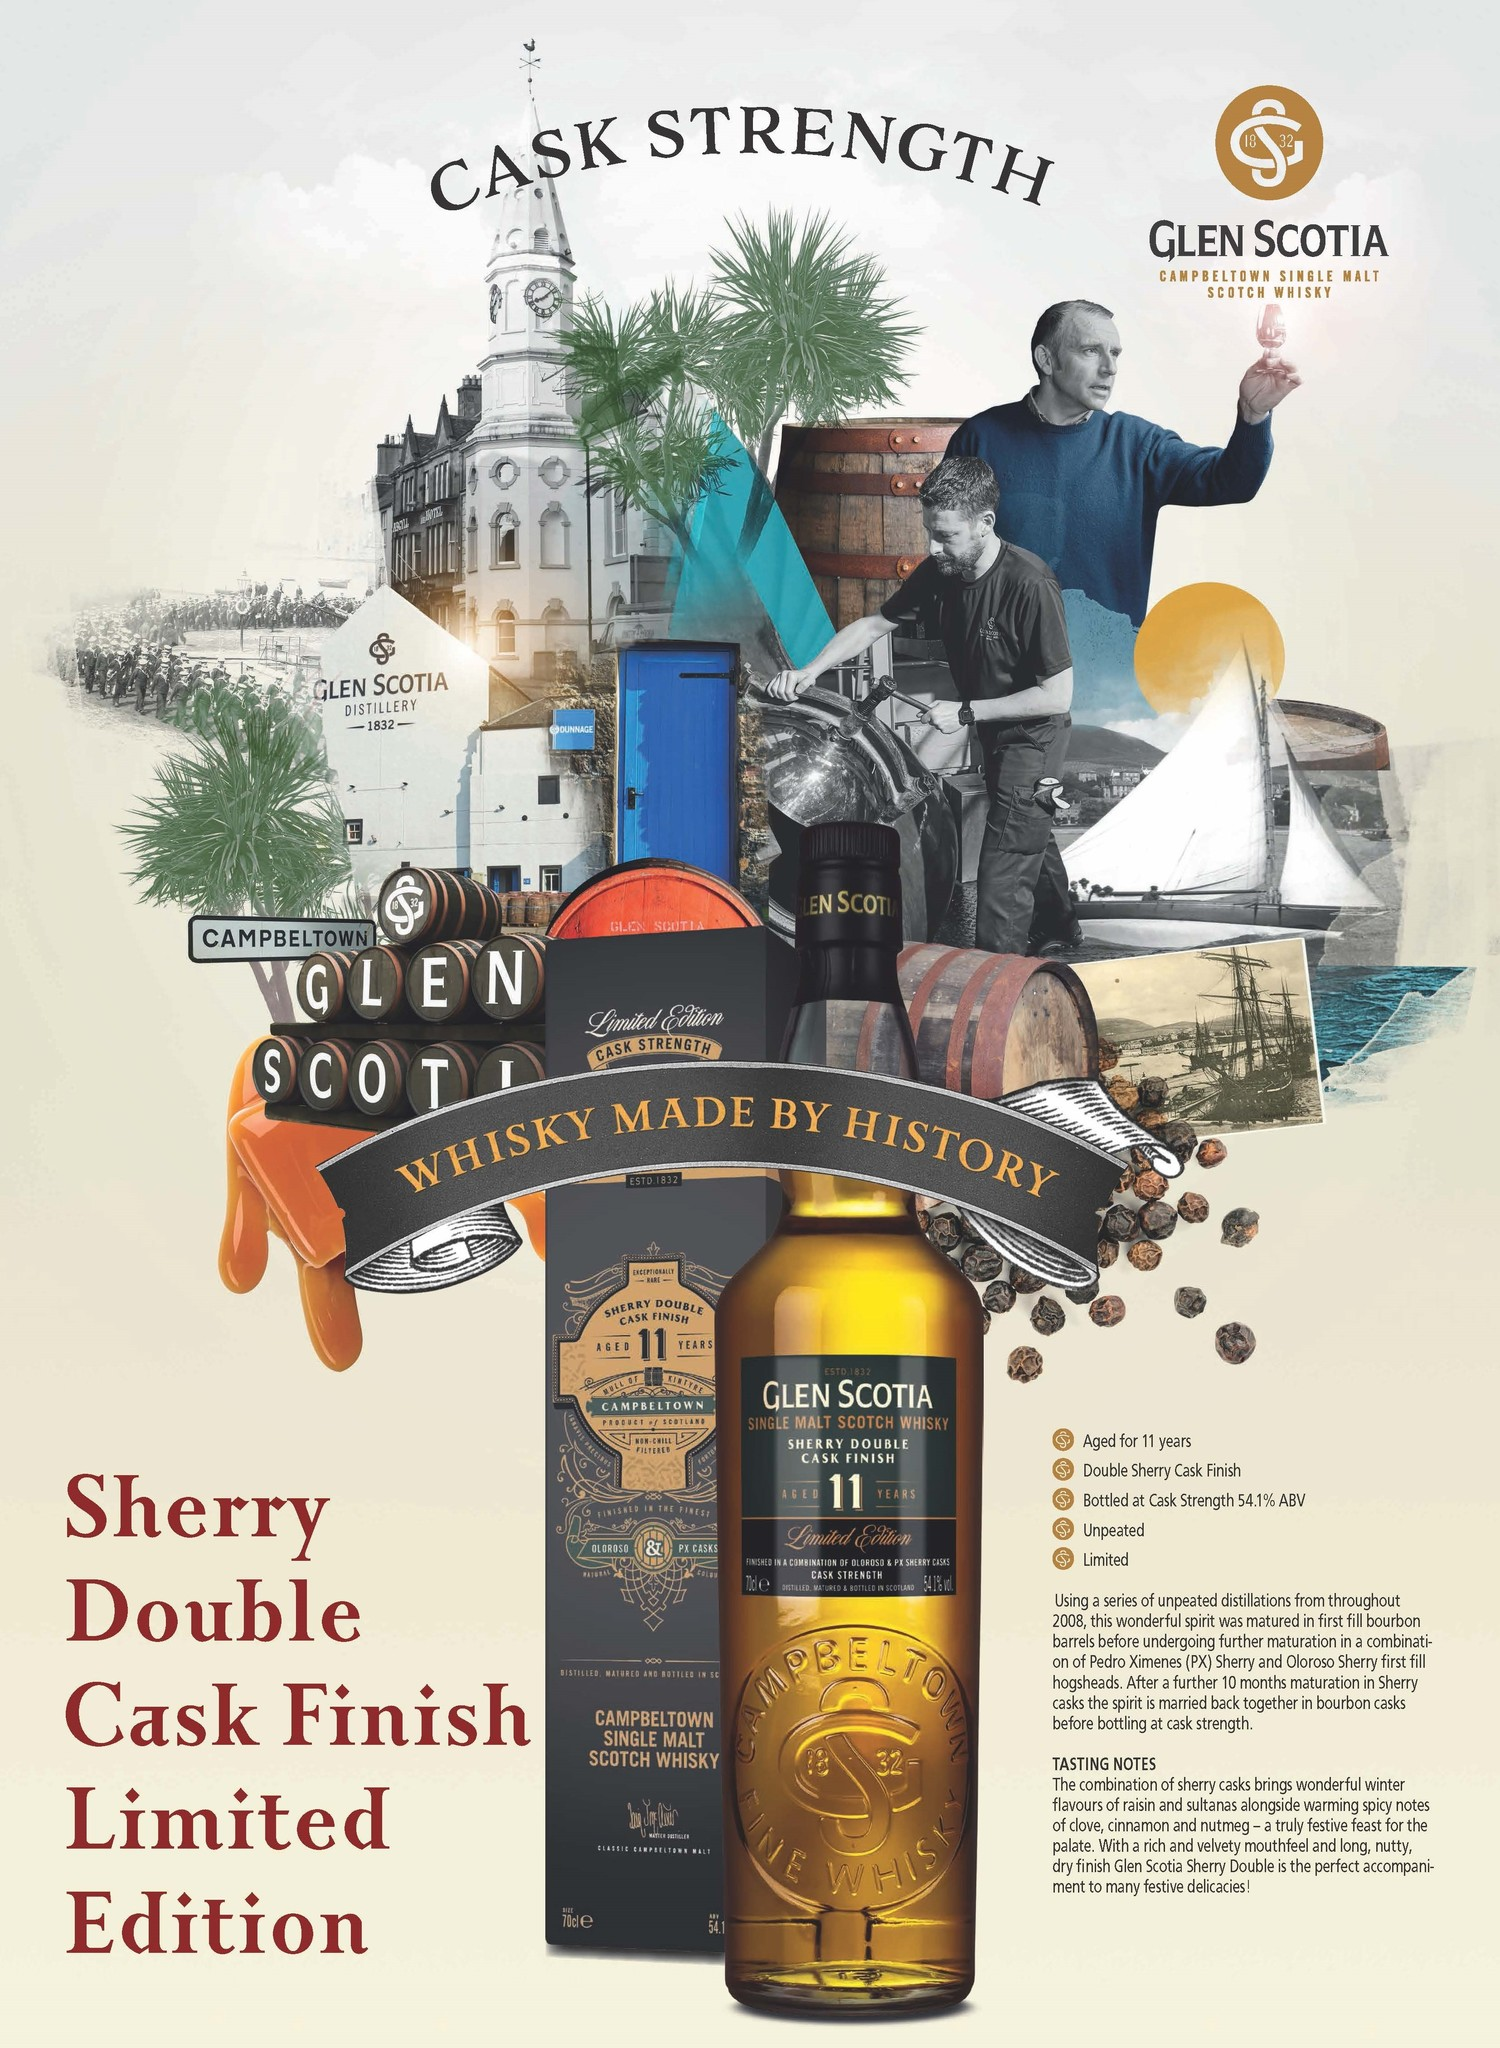 Neue limitierte Abfüllung aus Campbeltown: Glen Scotia Sherry Double Cask in Fassstärke